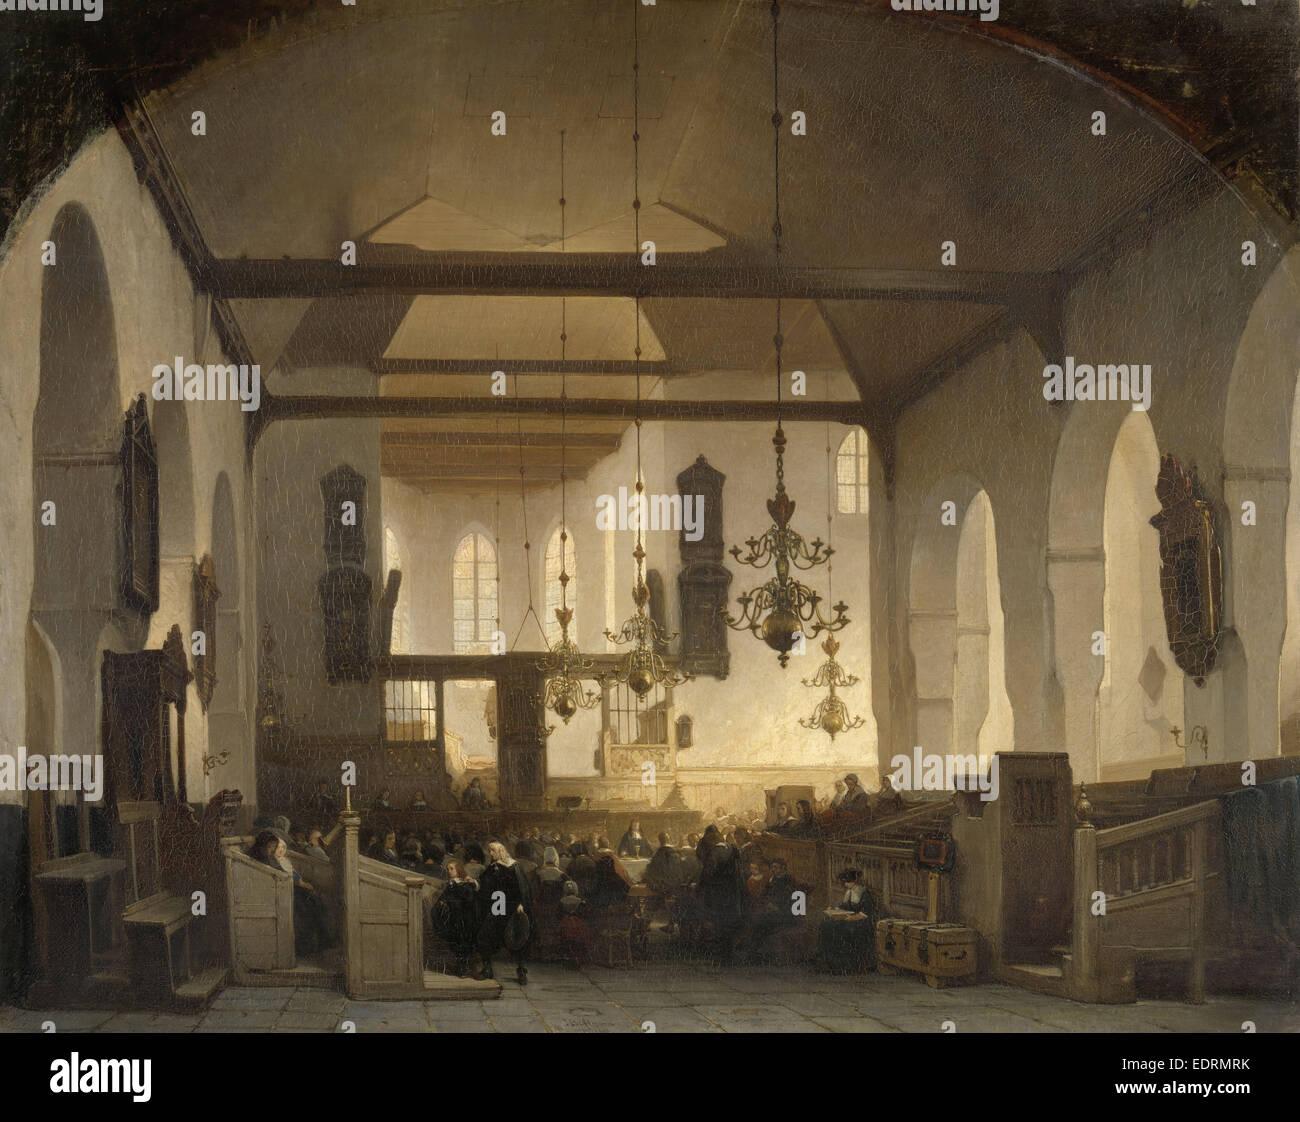 Un Service dans le Geertekerk, Utrecht, Pays-Bas, Johannes Bosboom, 1852 Photo Stock